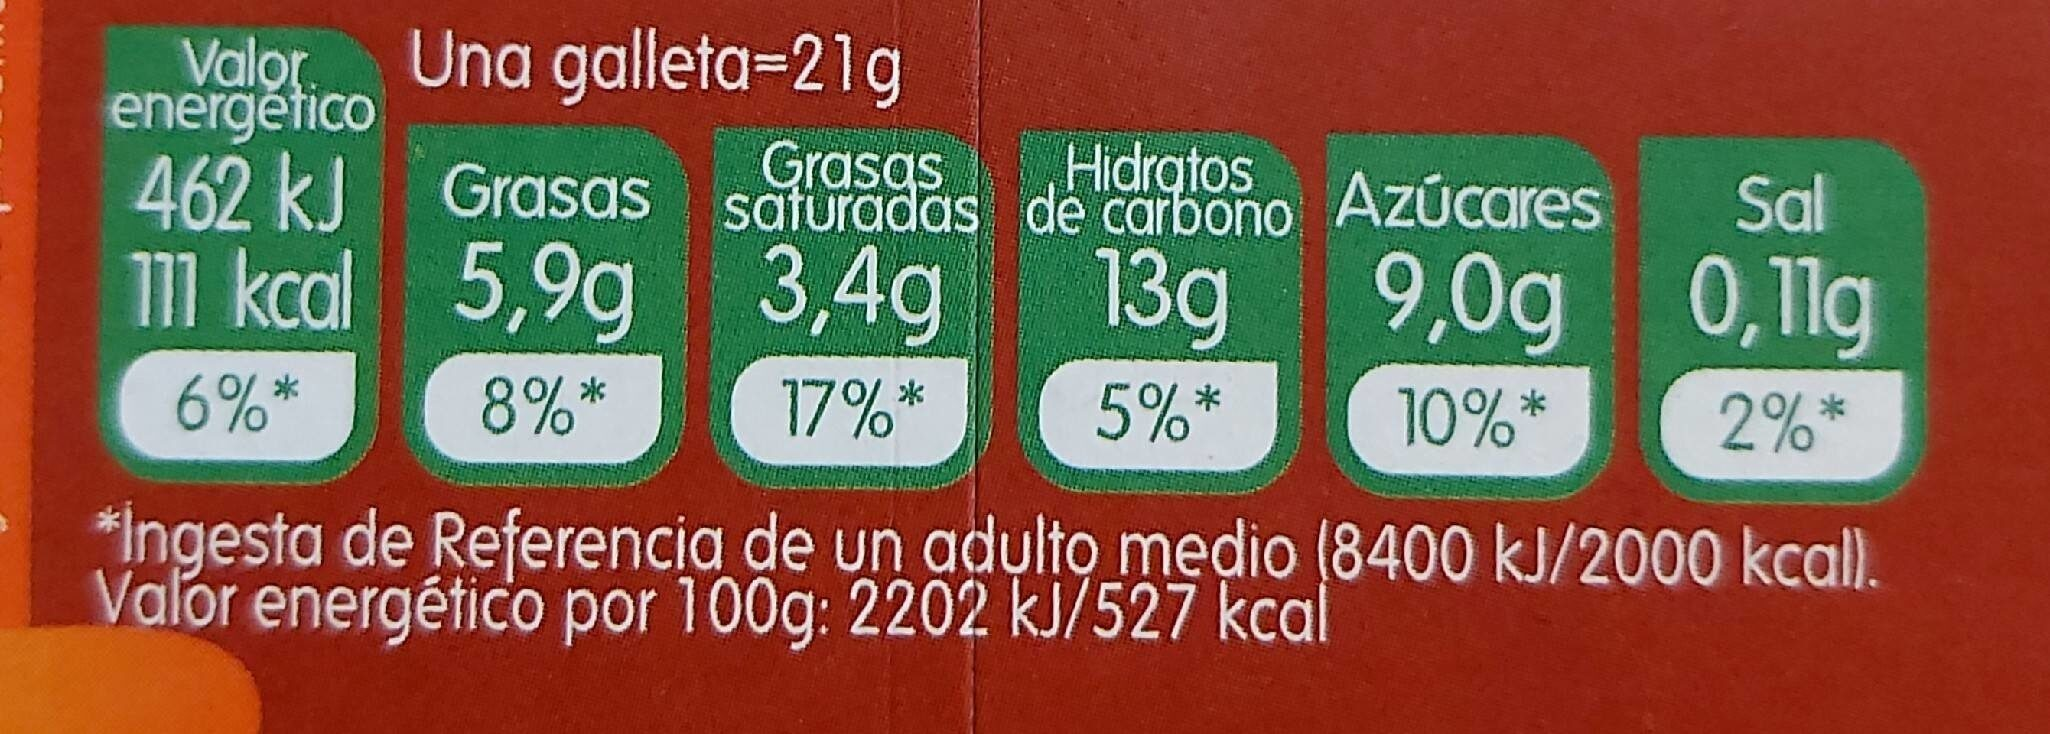 Galletas al cacao bañadas de chocolate con leche - Nutrition facts